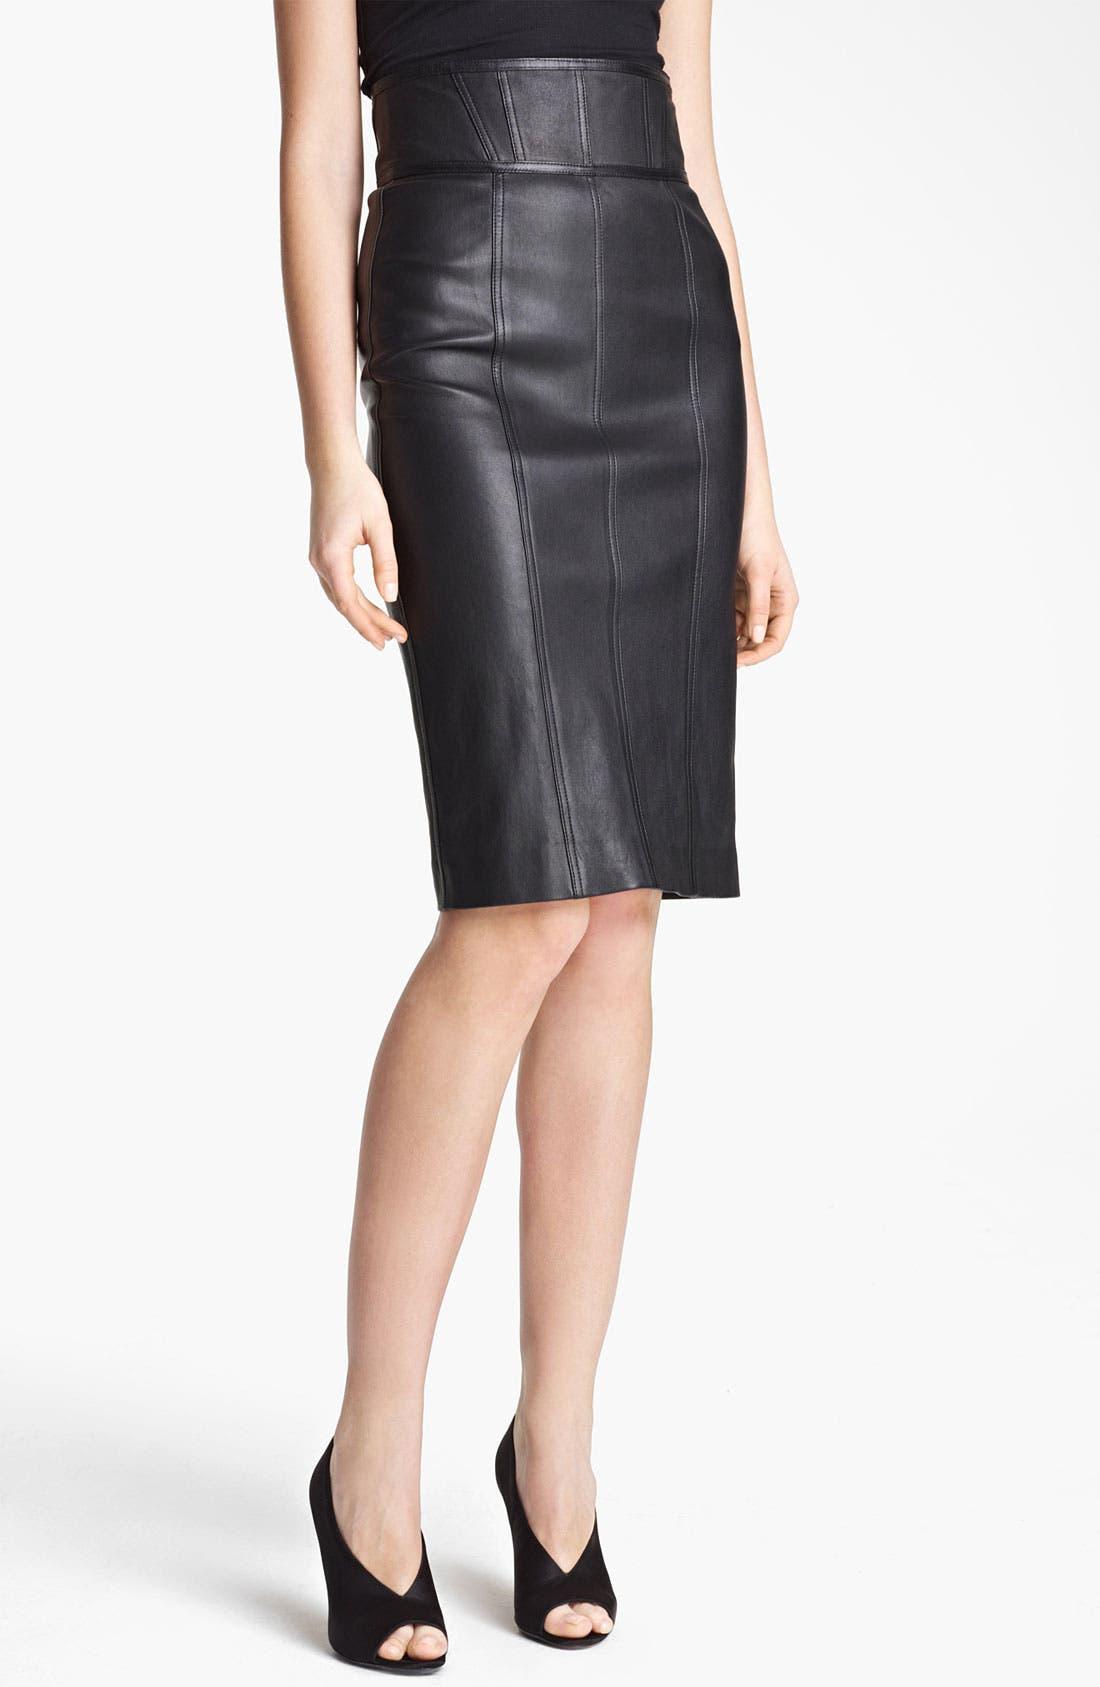 Alternate Image 1 Selected - Burberry London High Waist Leather Skirt